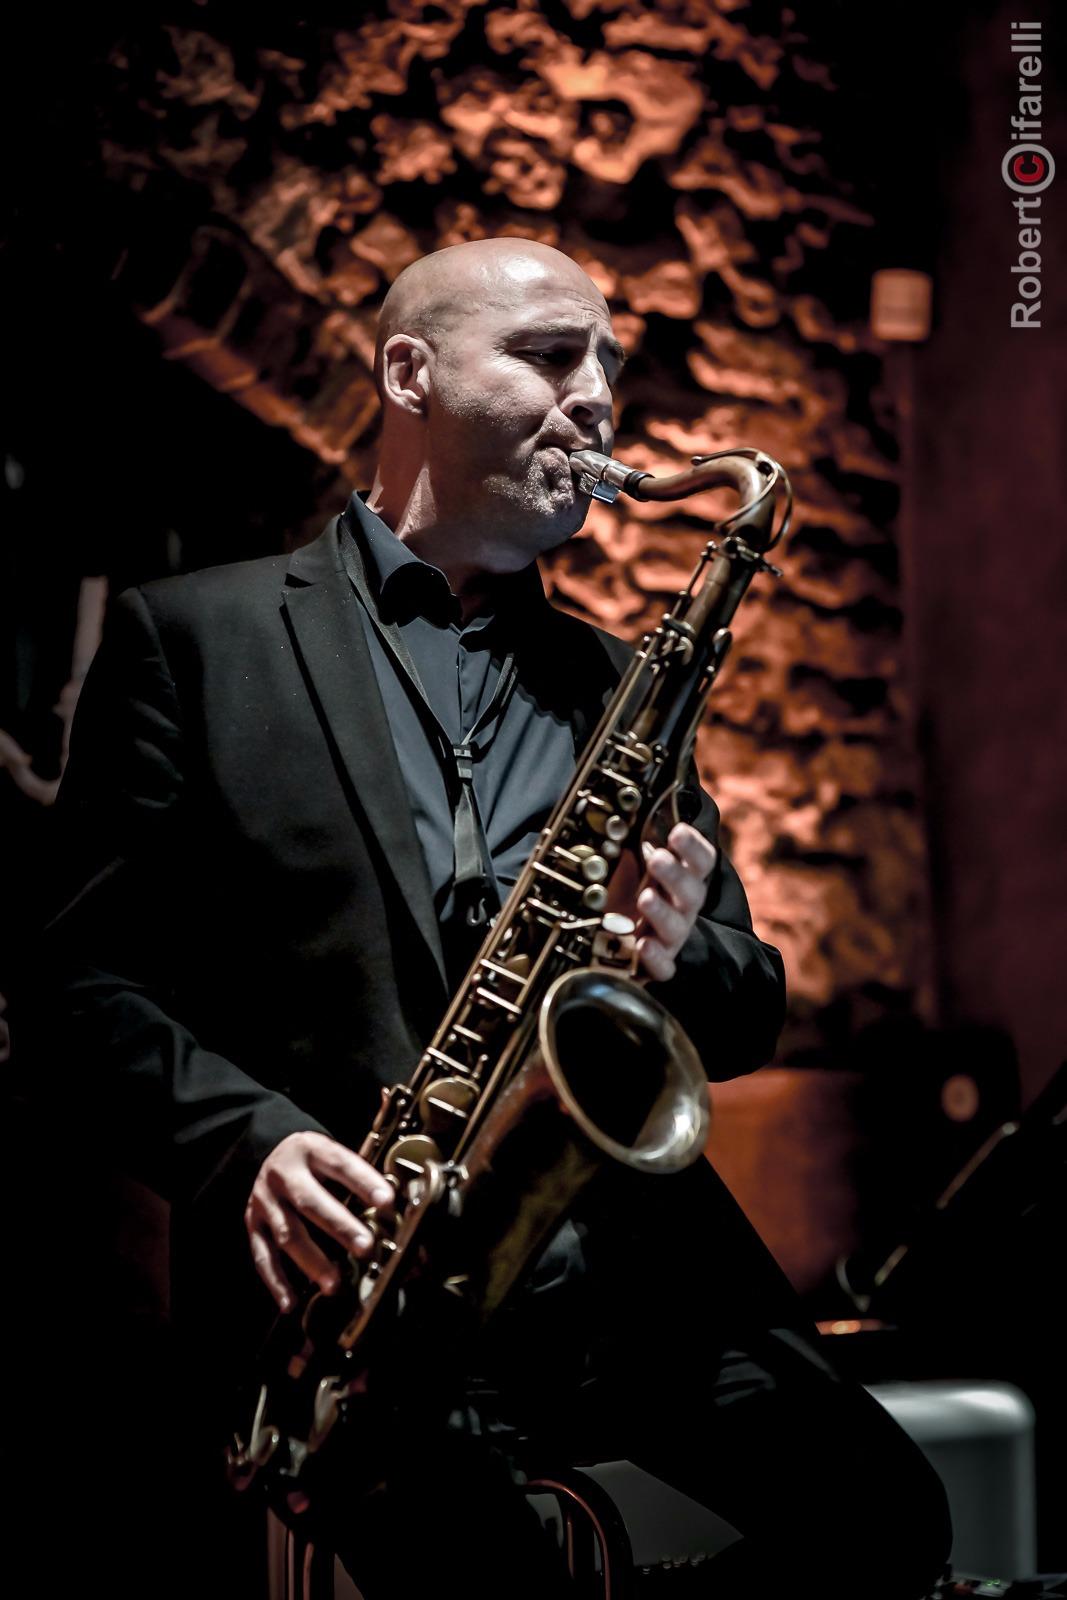 Mirko Fait, photo by Roberto Cifarelli